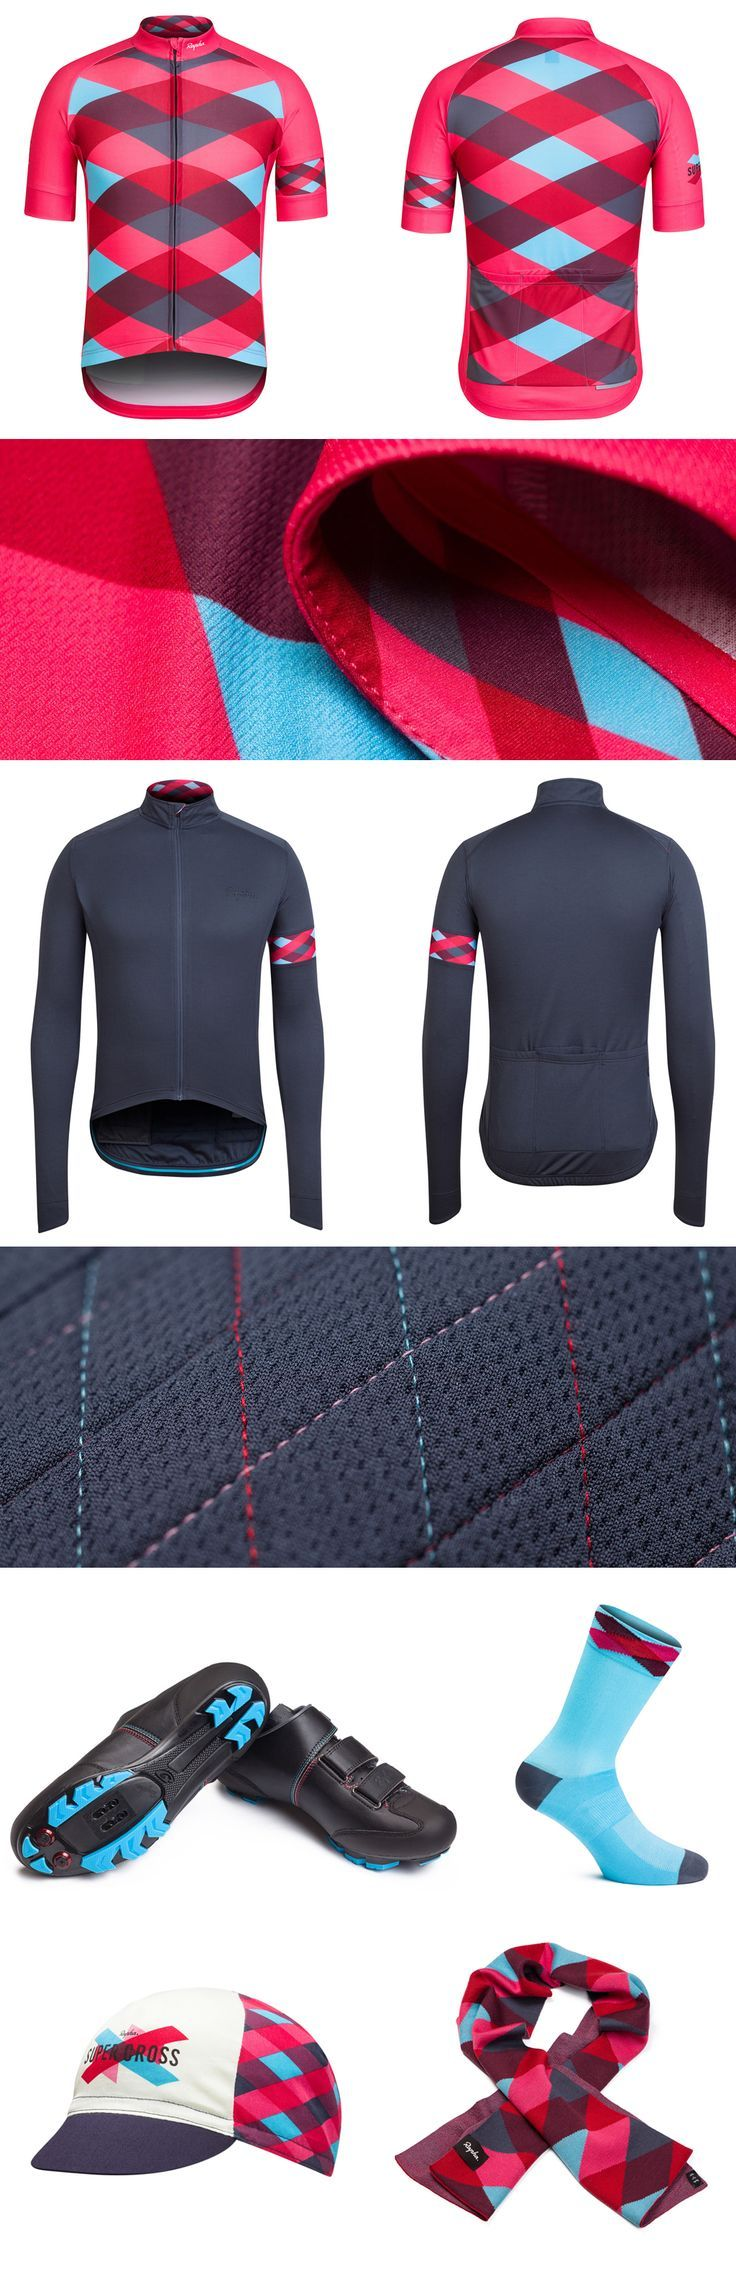 Rapha SuperCross Collection http://www.rapha.cc/ca/en/shop/cyclocross/category/cyclocross